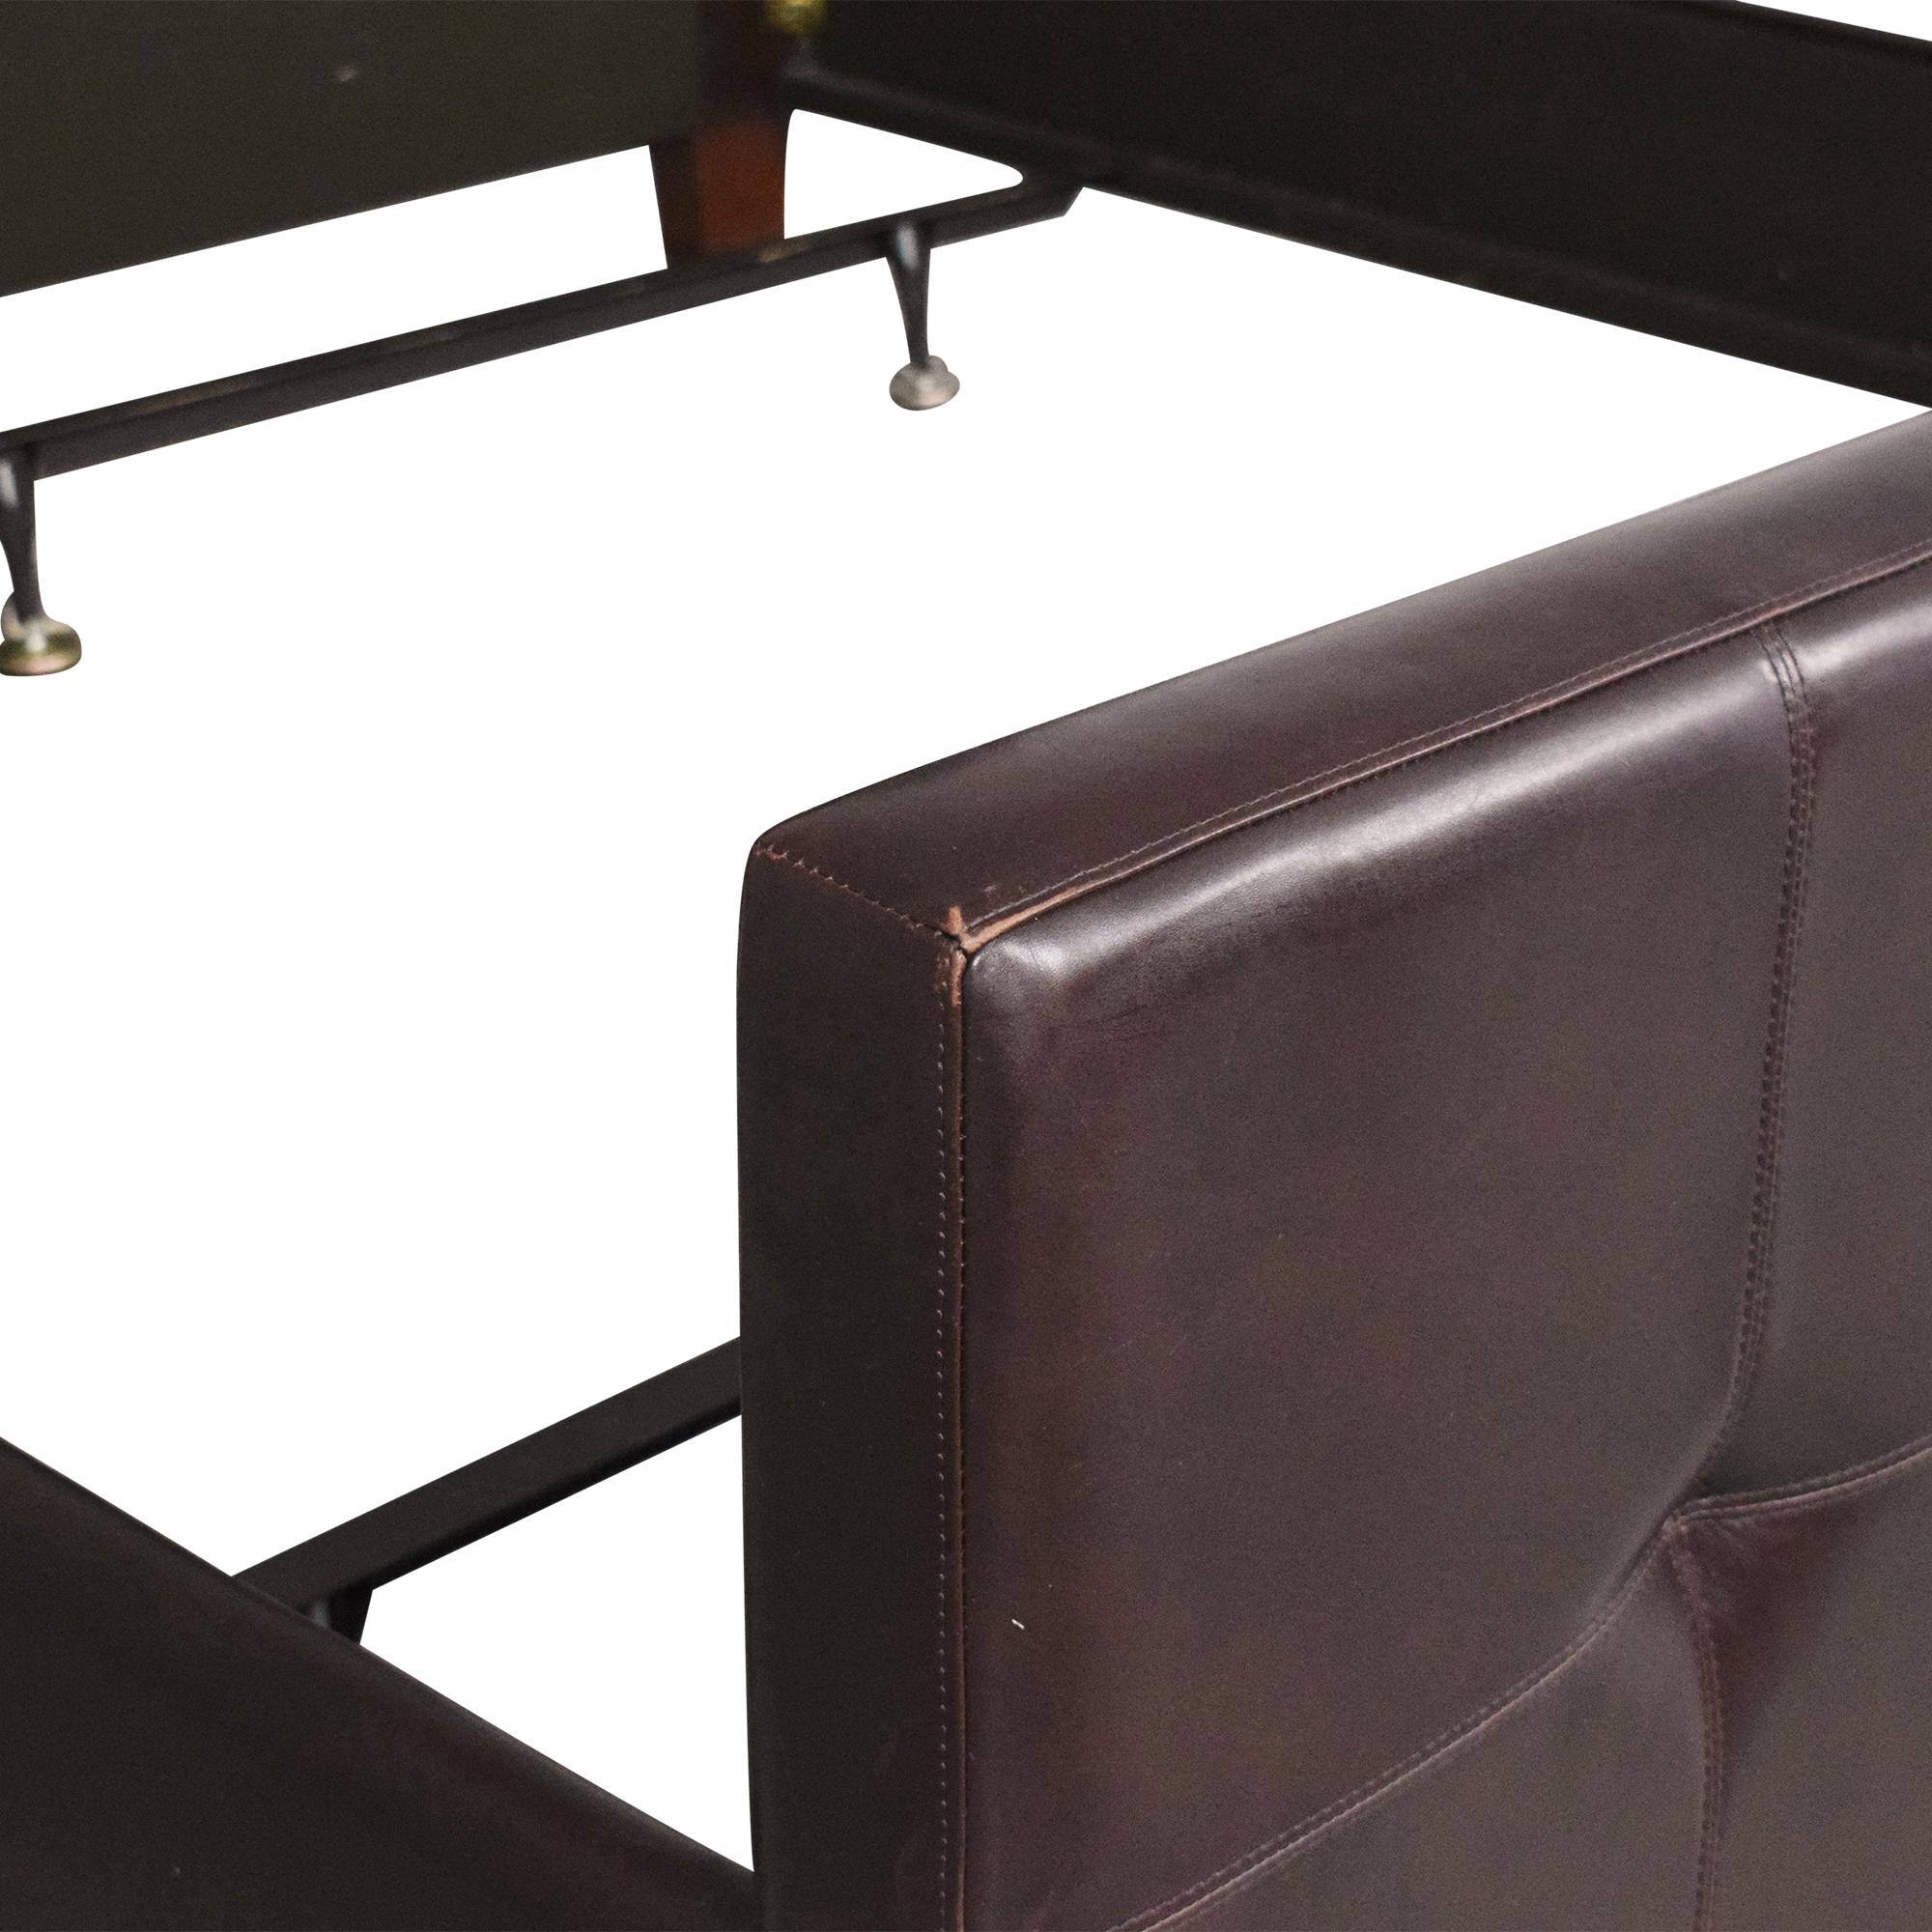 Crate & Barrel Crate & Barrel Tufted King Bed for sale